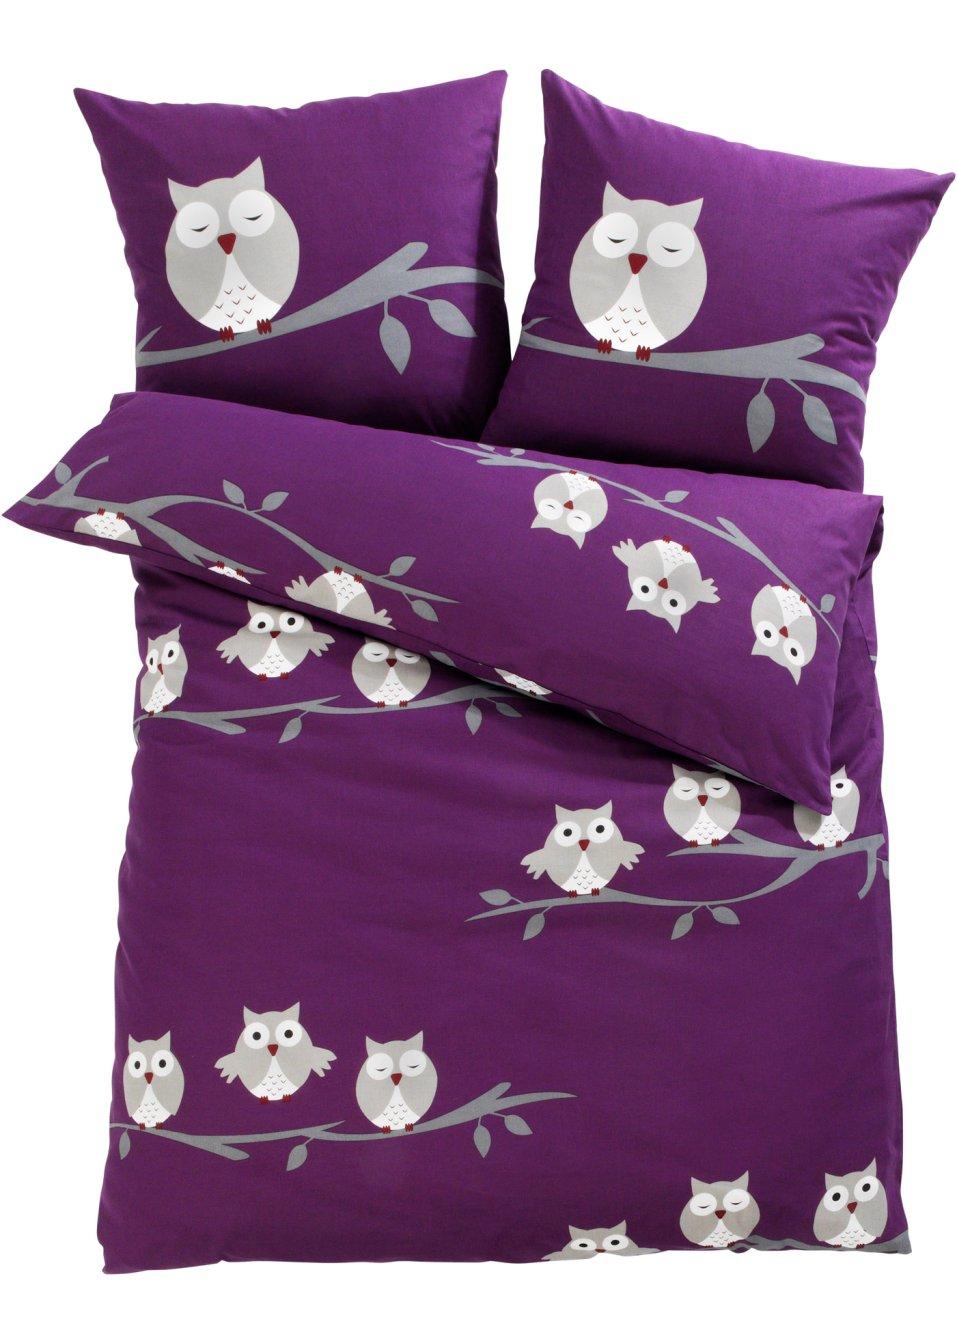 ein sch ner blickfang die bettw sche lea lila linon. Black Bedroom Furniture Sets. Home Design Ideas